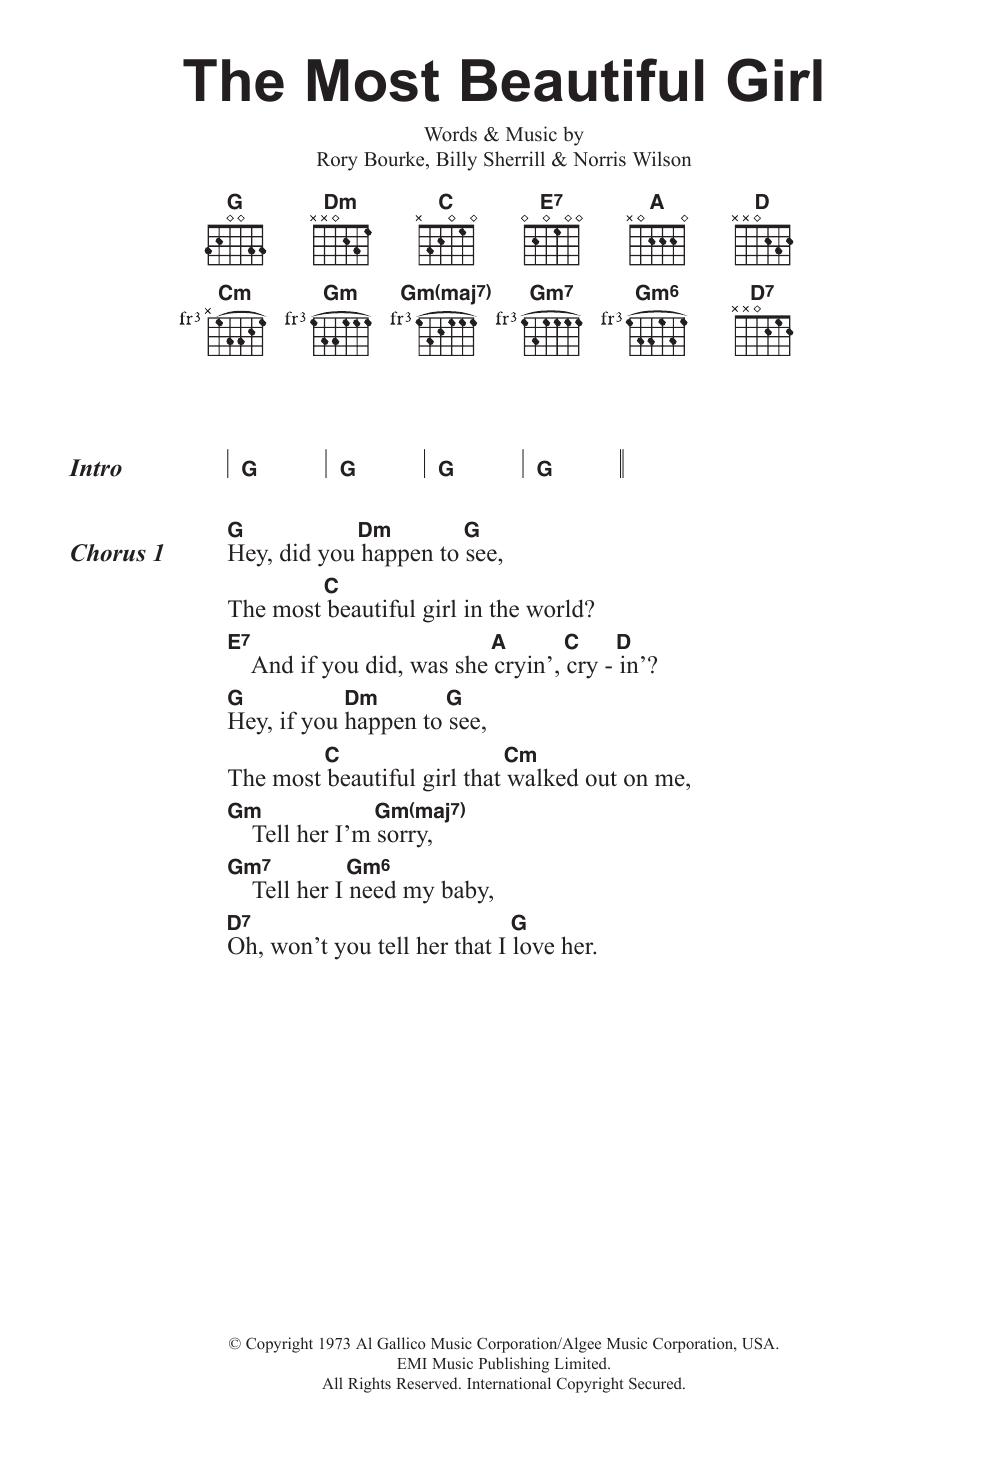 The Most Beautiful Girl Charlie Rich Lyrics Chords